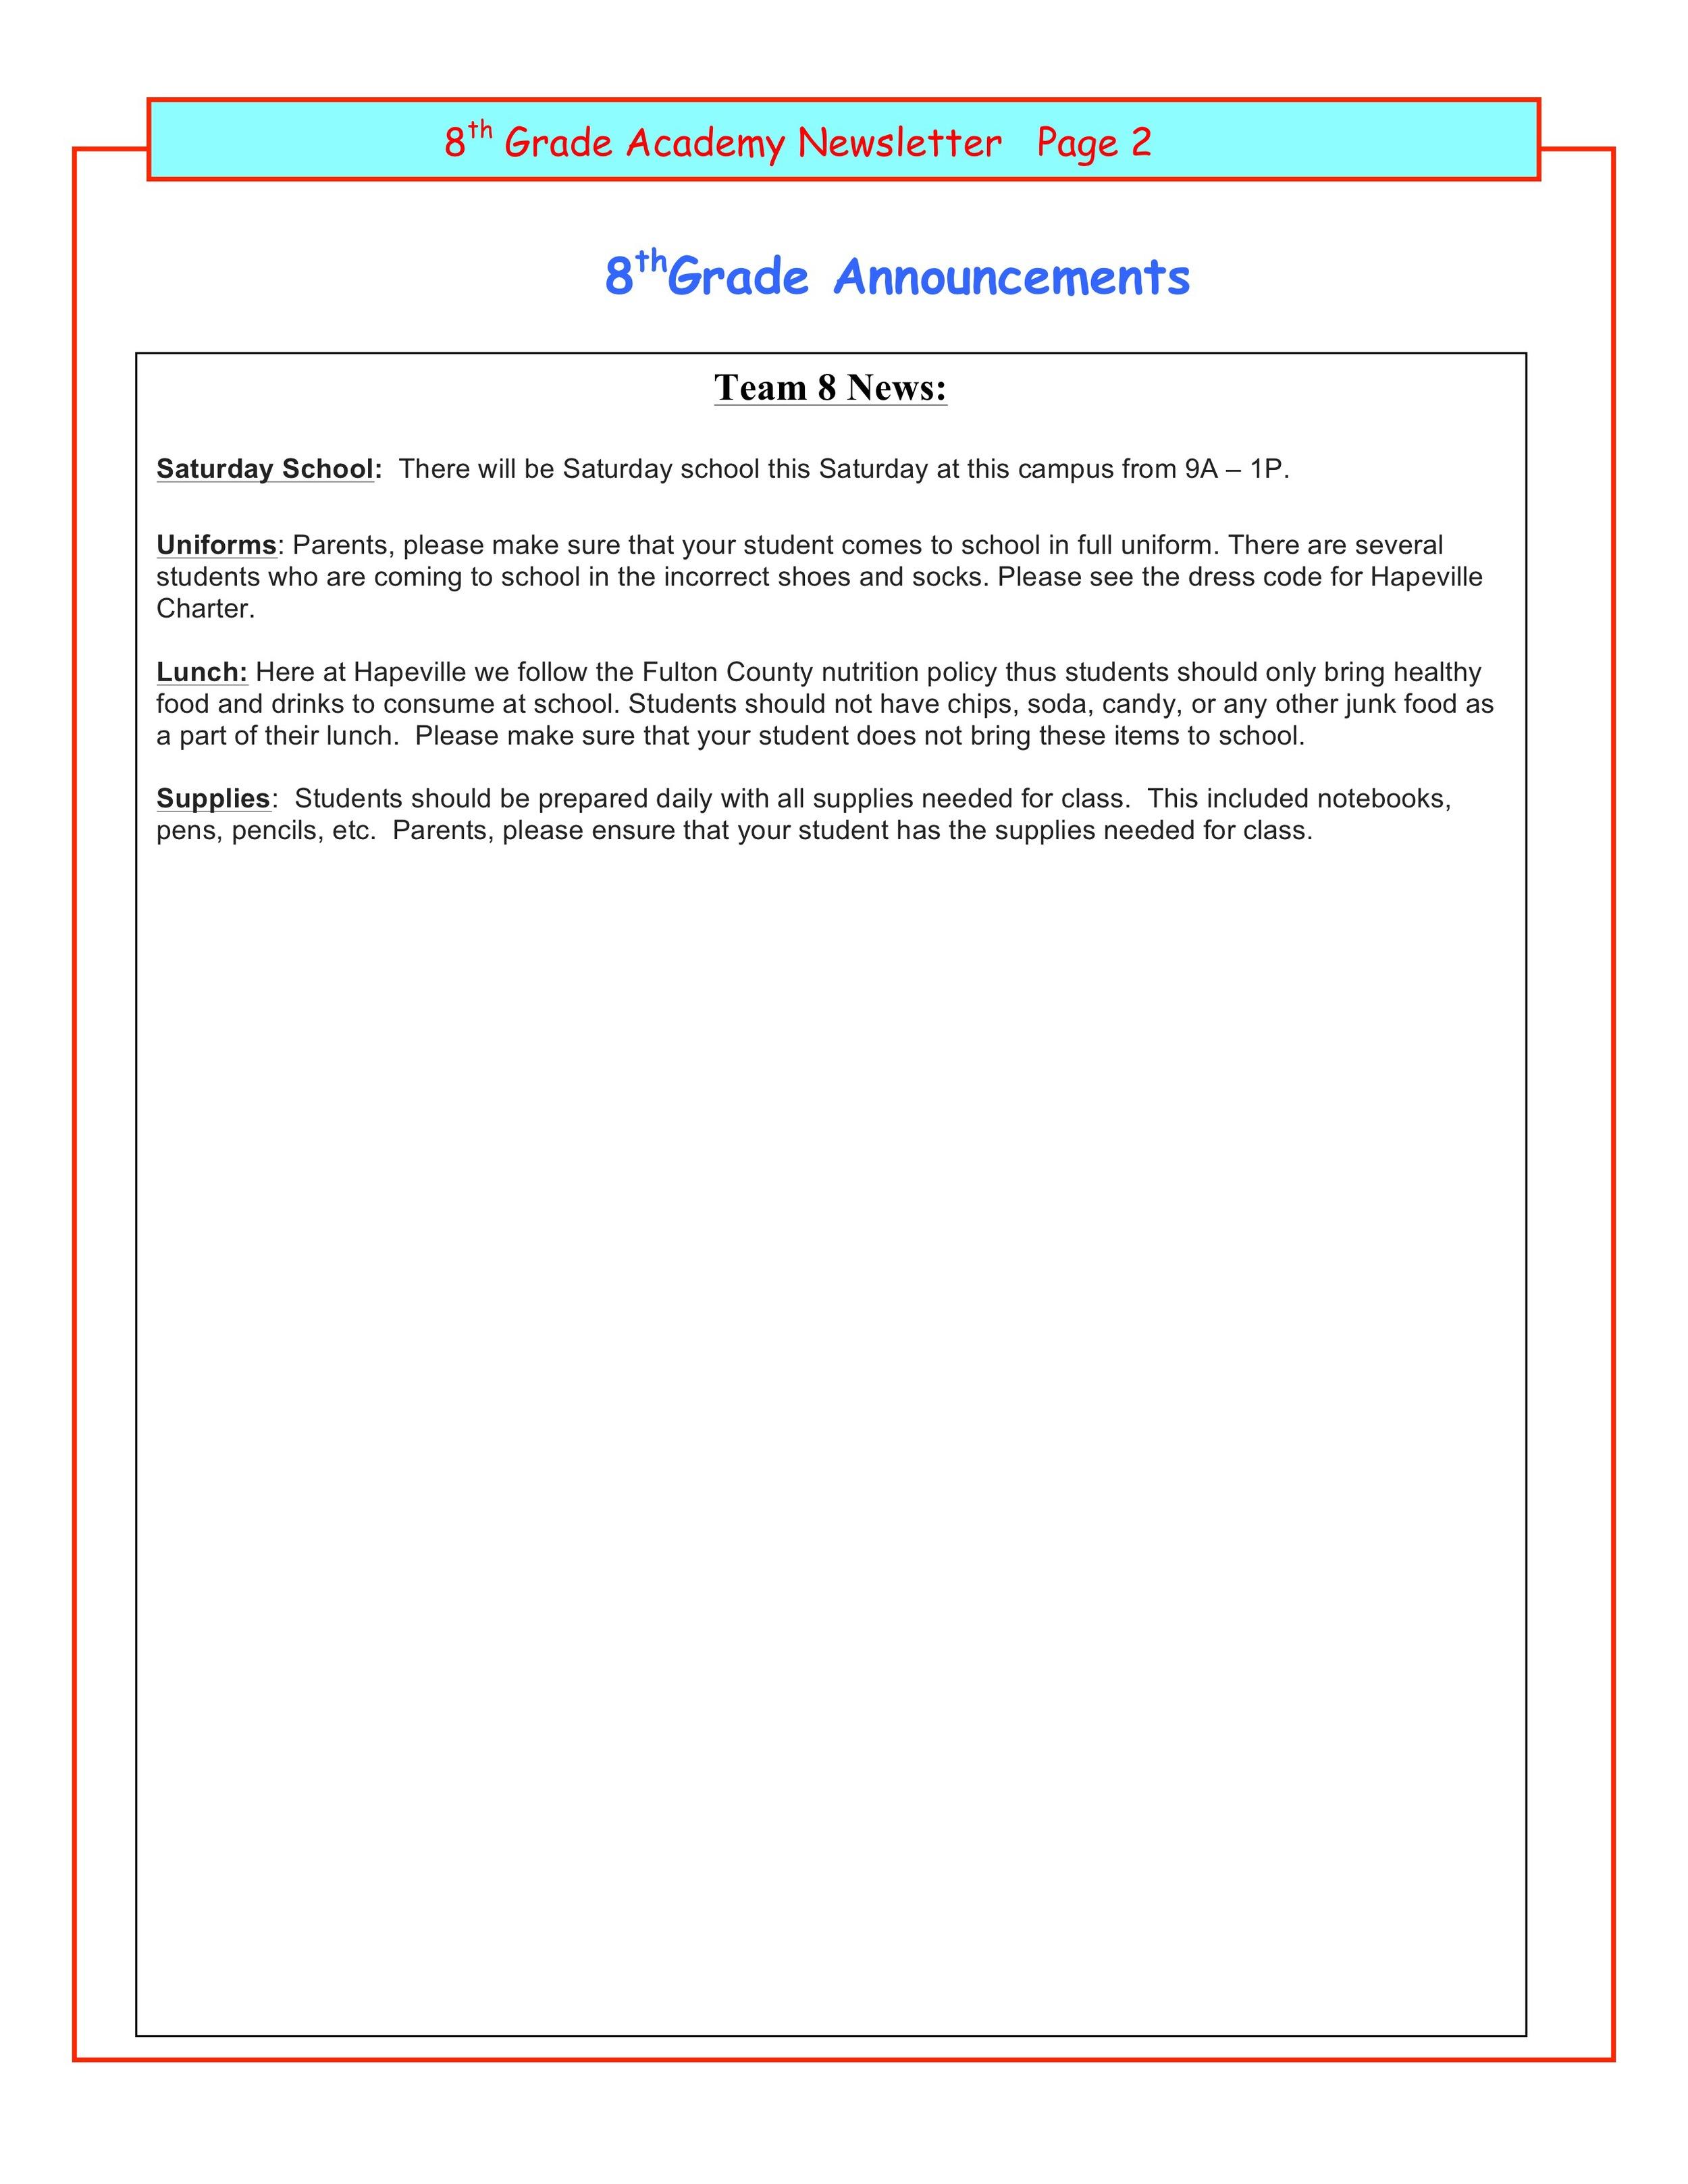 Newsletter Image8th grade nov 10-14 2.jpeg